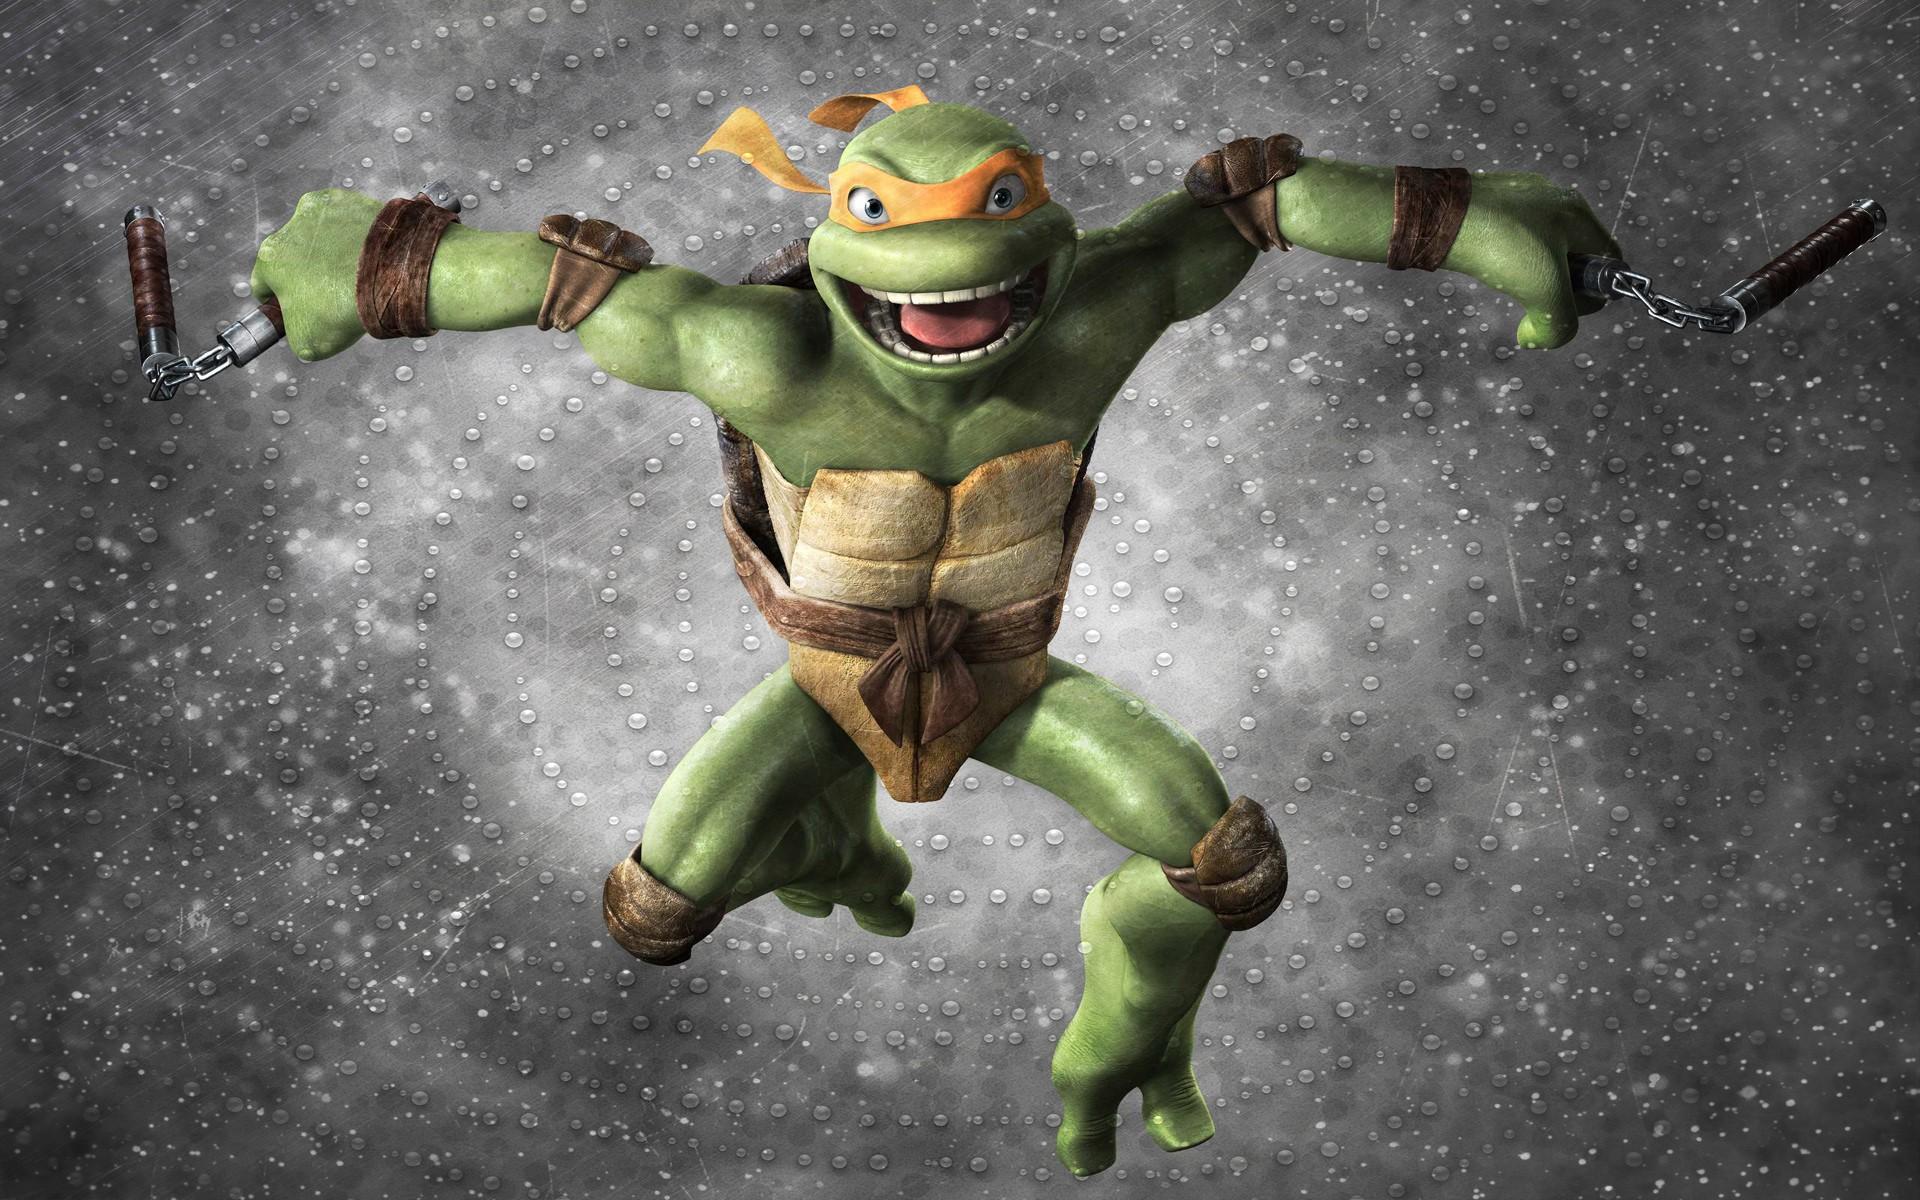 Las tortugas ninja - 1920x1200